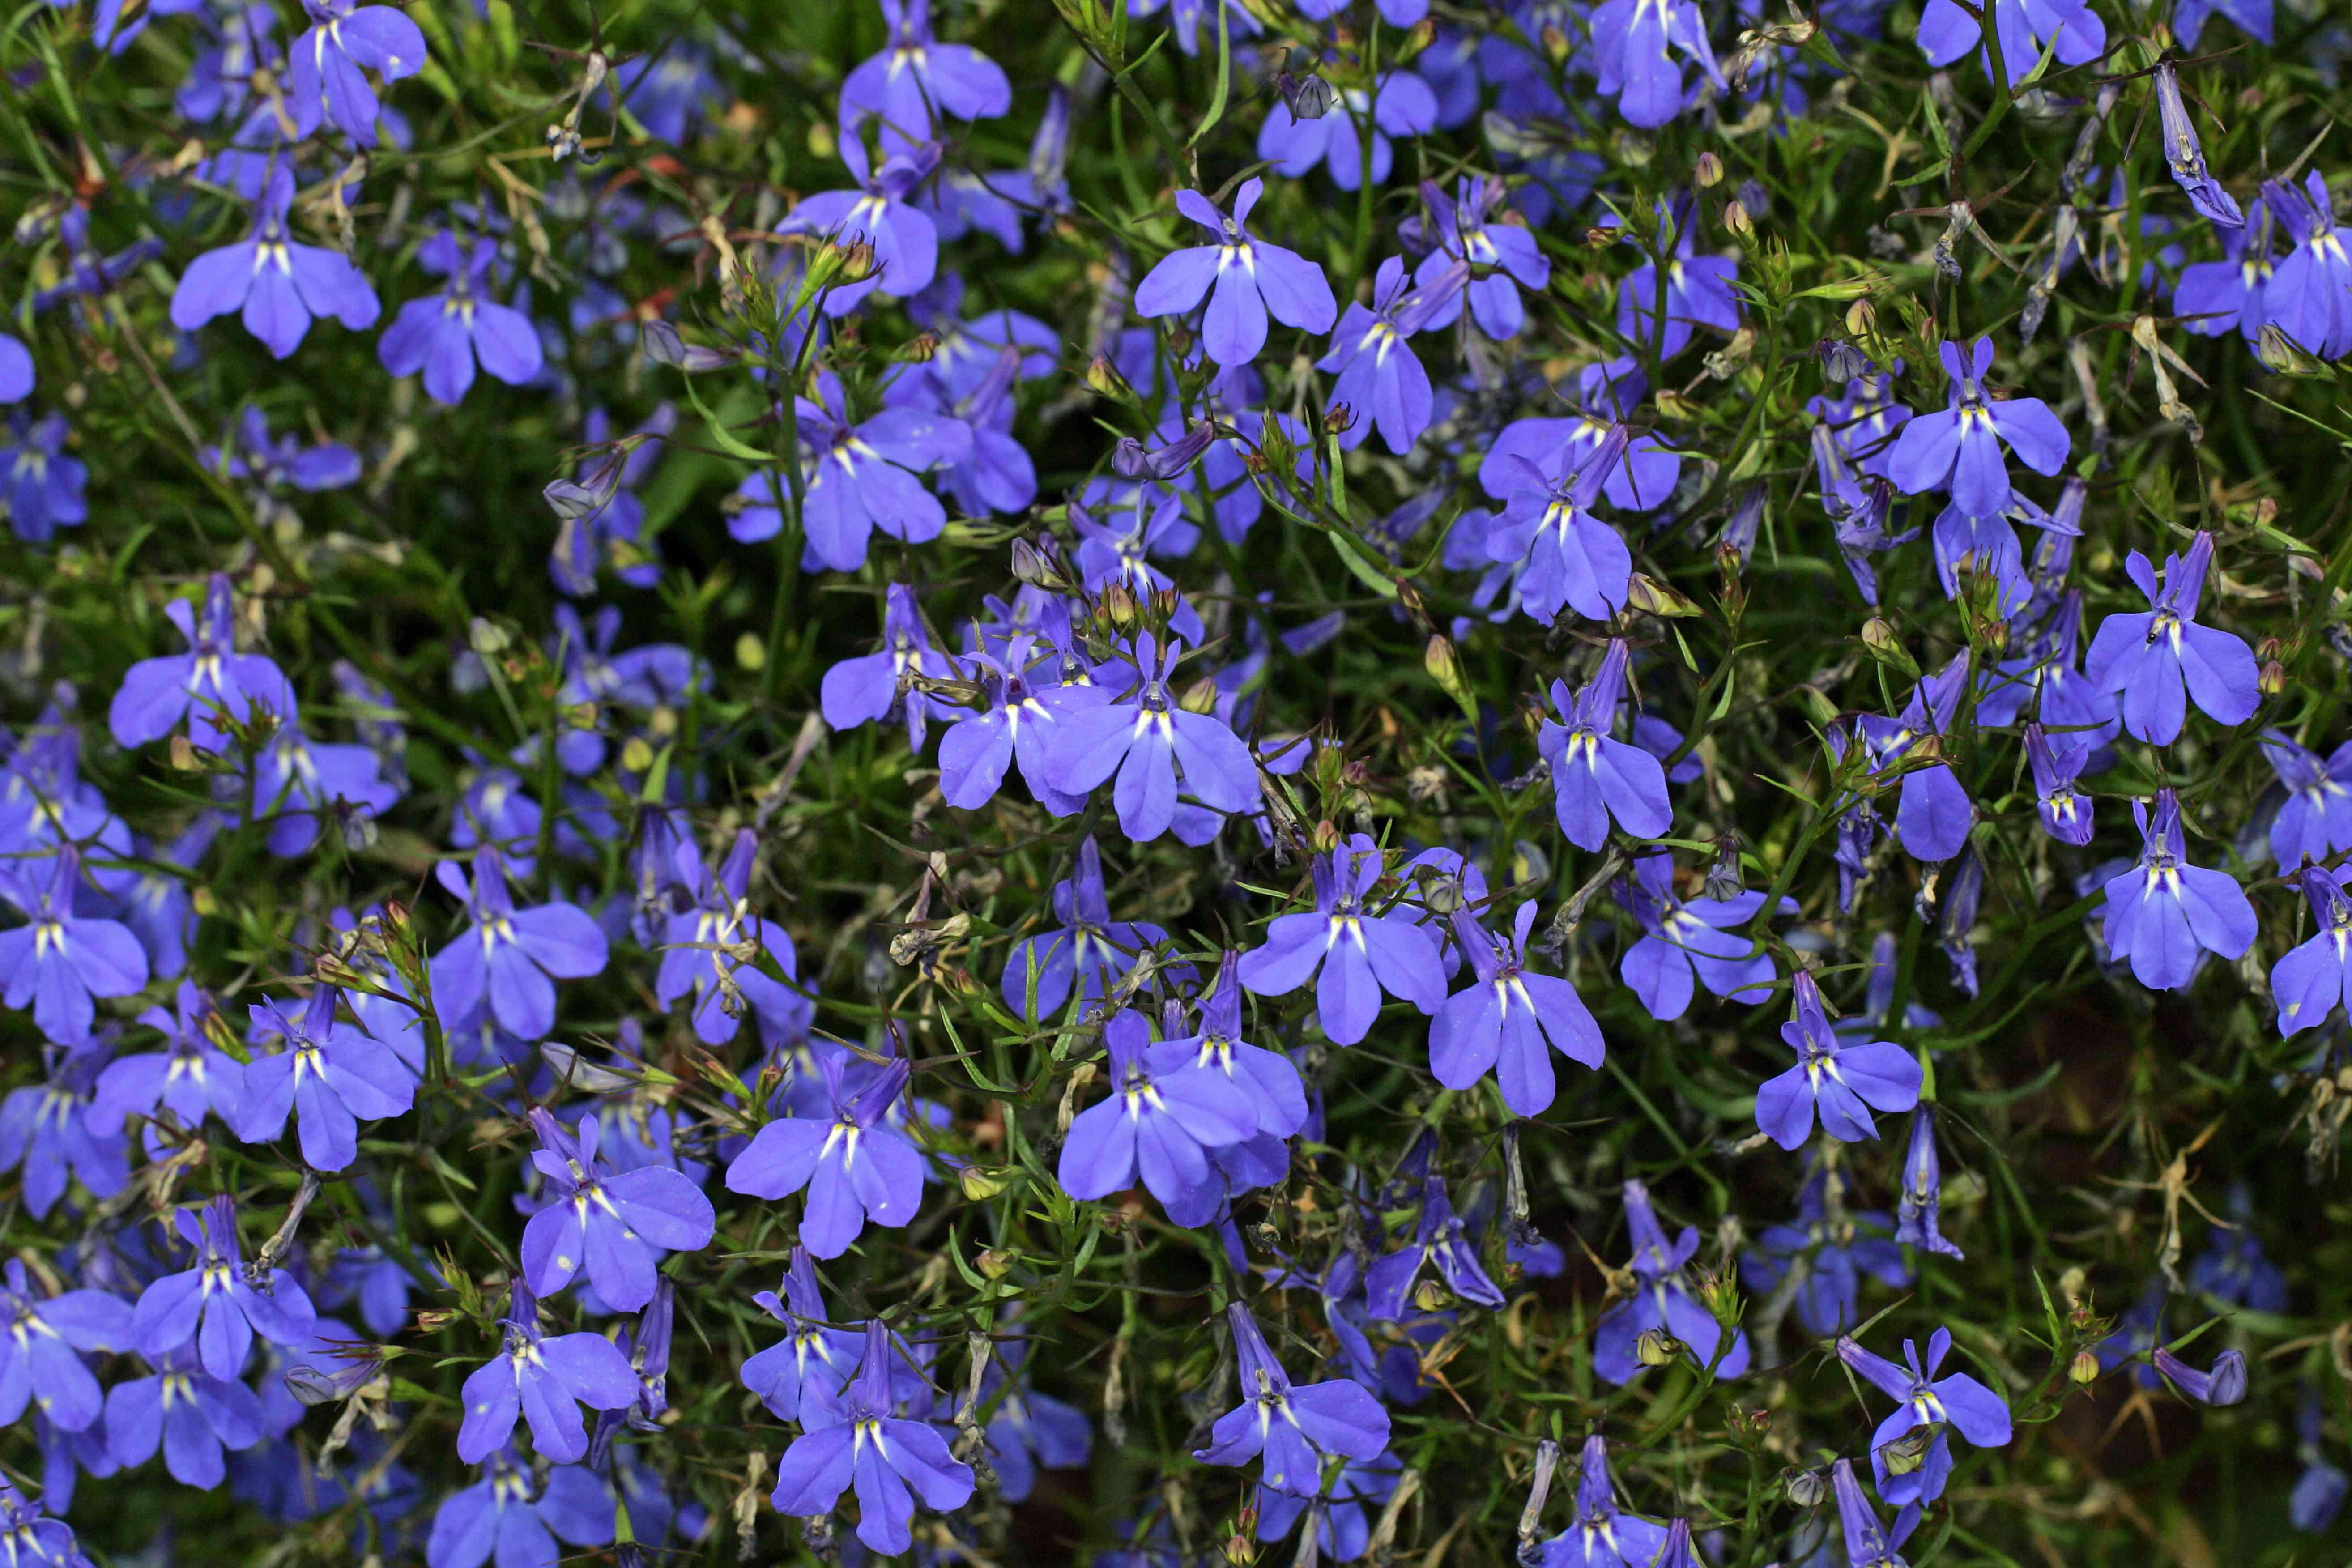 flowering hanging lobelia (Lobelia erinus cultivar Richardii) (Lobelia Richardii)